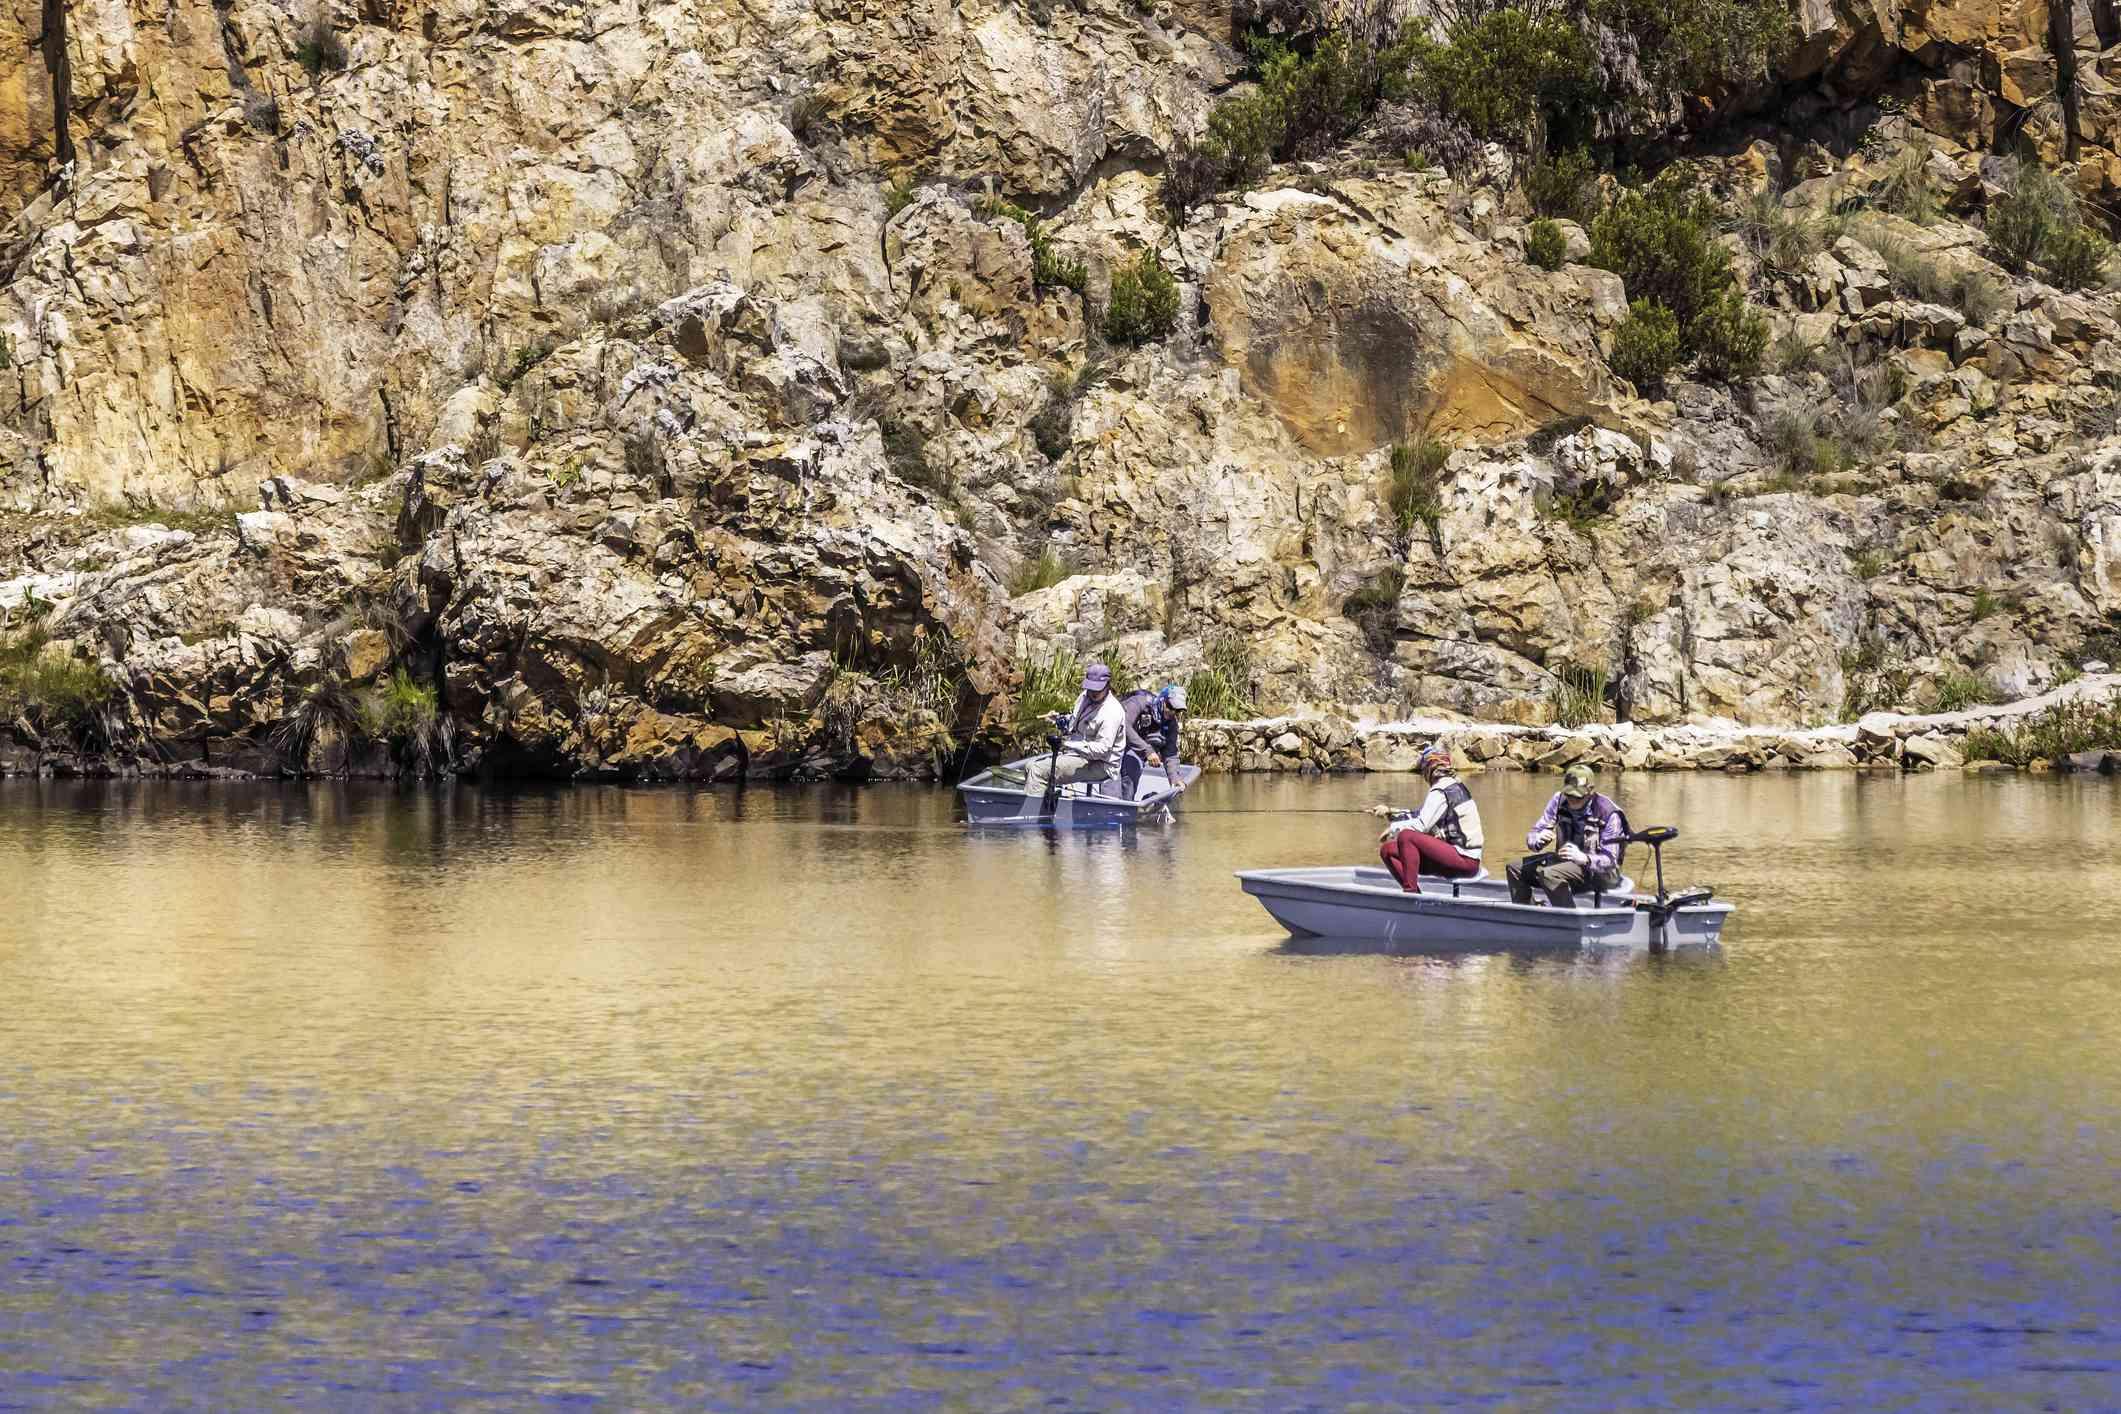 Fishermen fresh water fishing in Dullstroom, South Africa